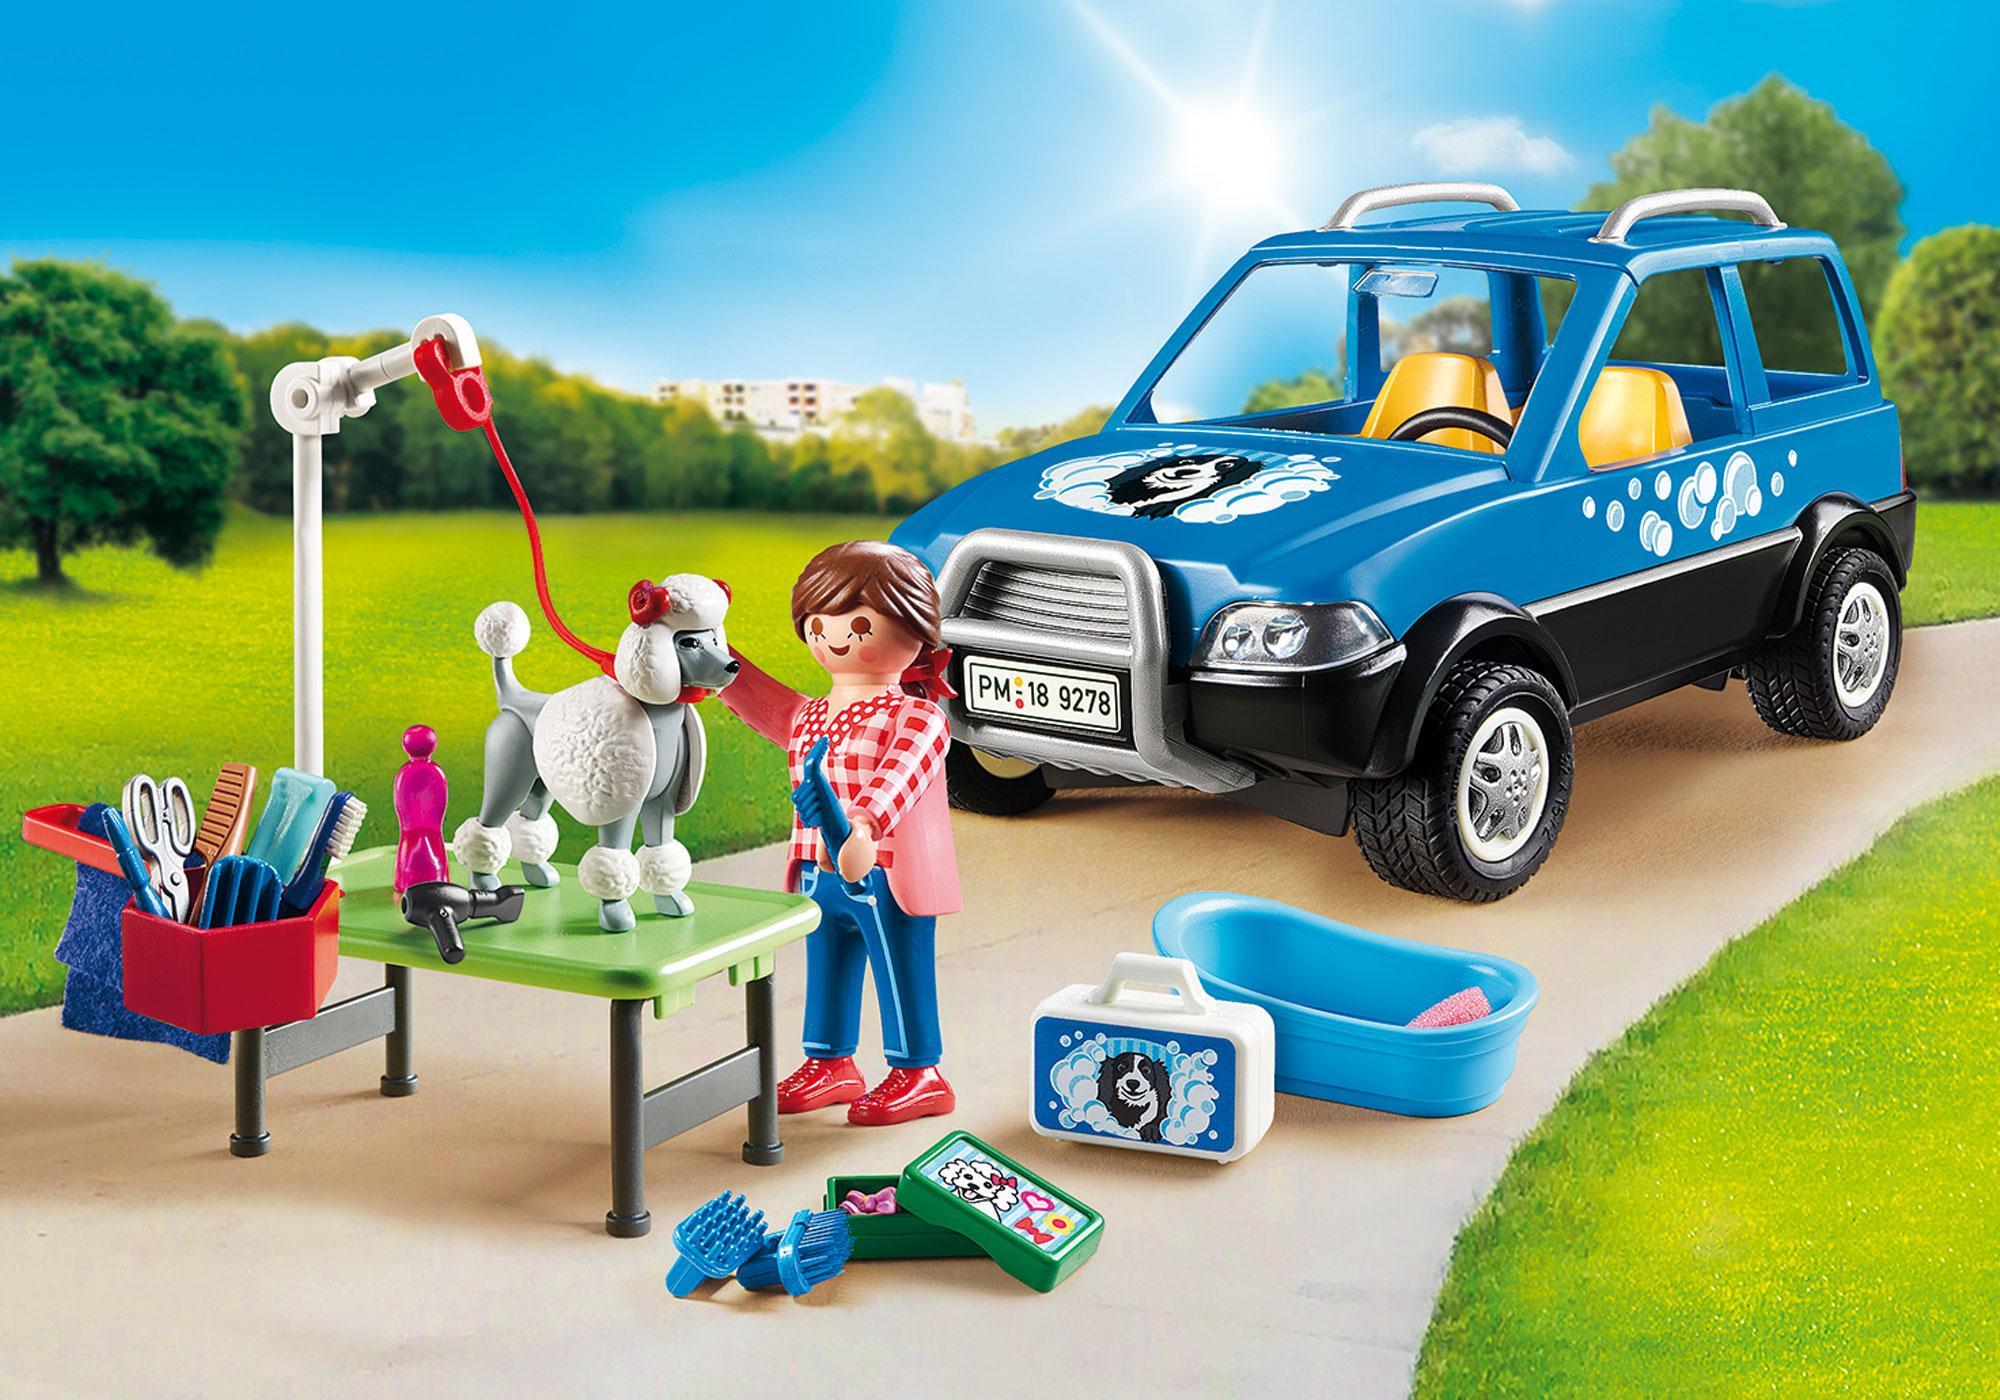 http://media.playmobil.com/i/playmobil/9278_product_detail/Κινητή μονάδα κτηνιατρικής φροντίδας